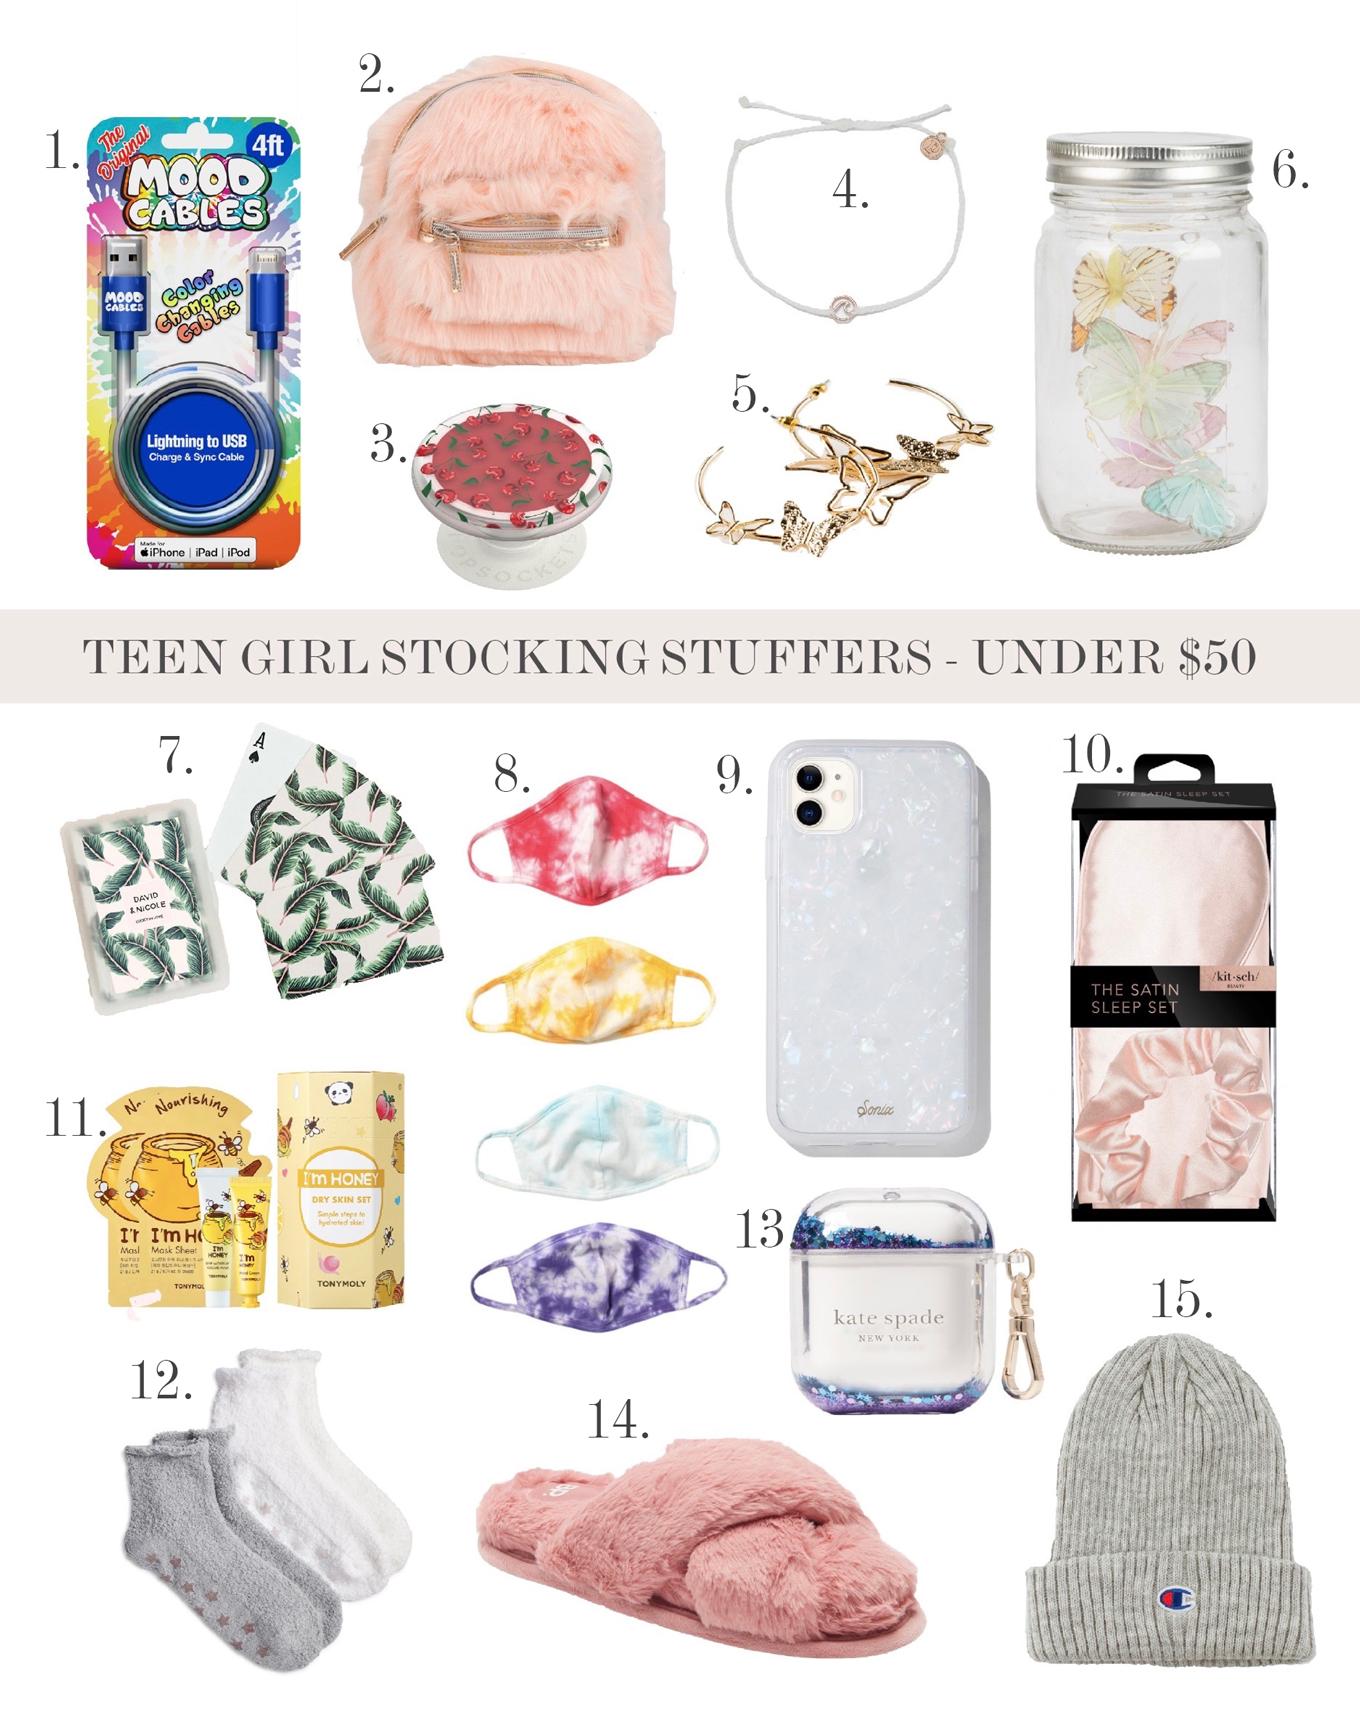 teen girl stocking stuffers